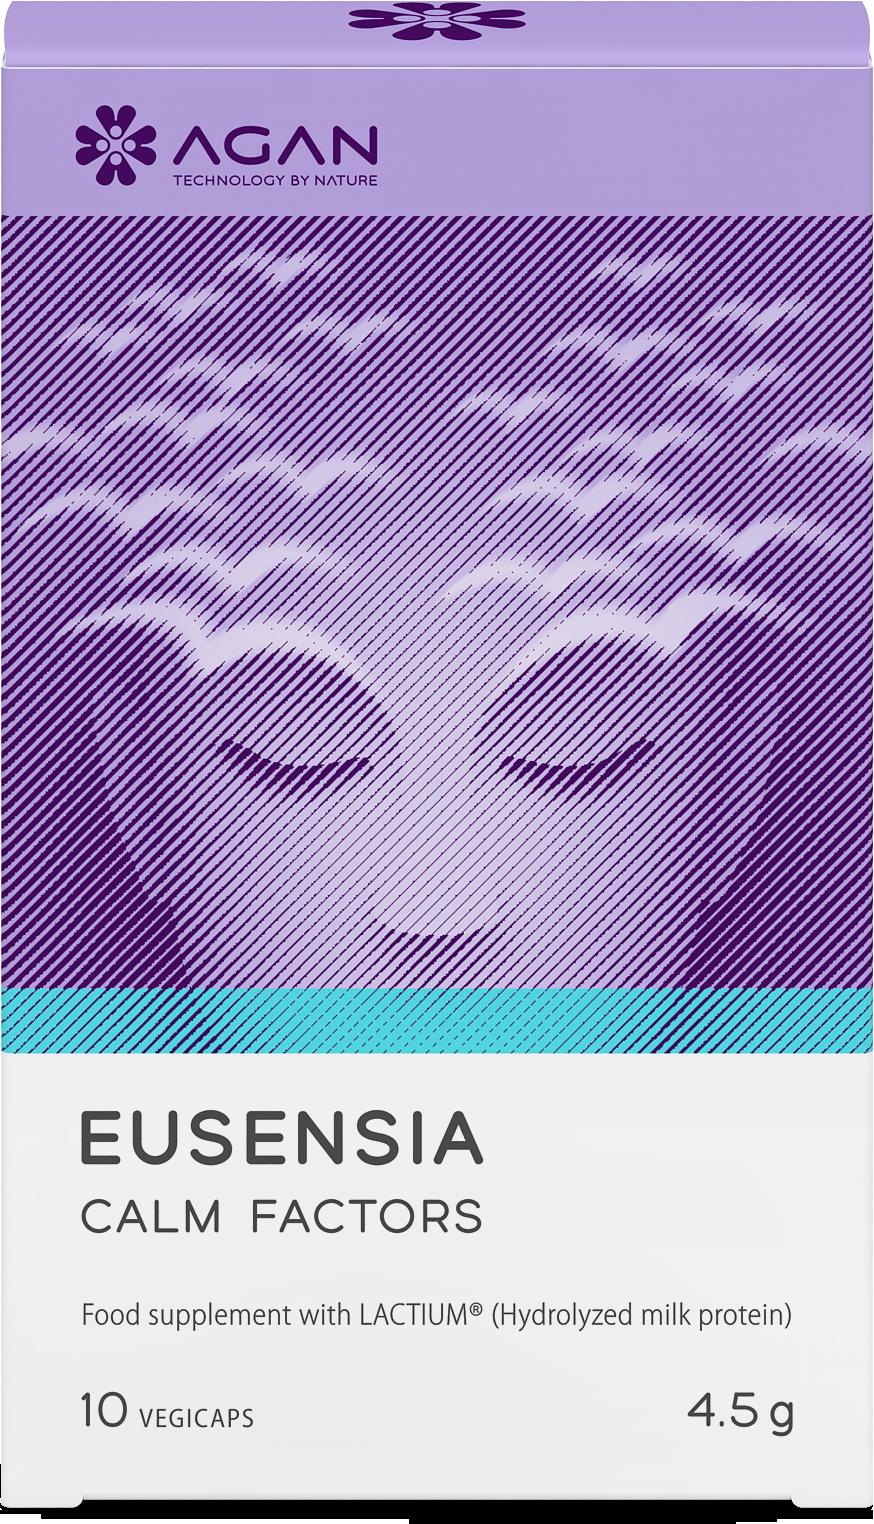 EUSENSIA CALM FACTORS